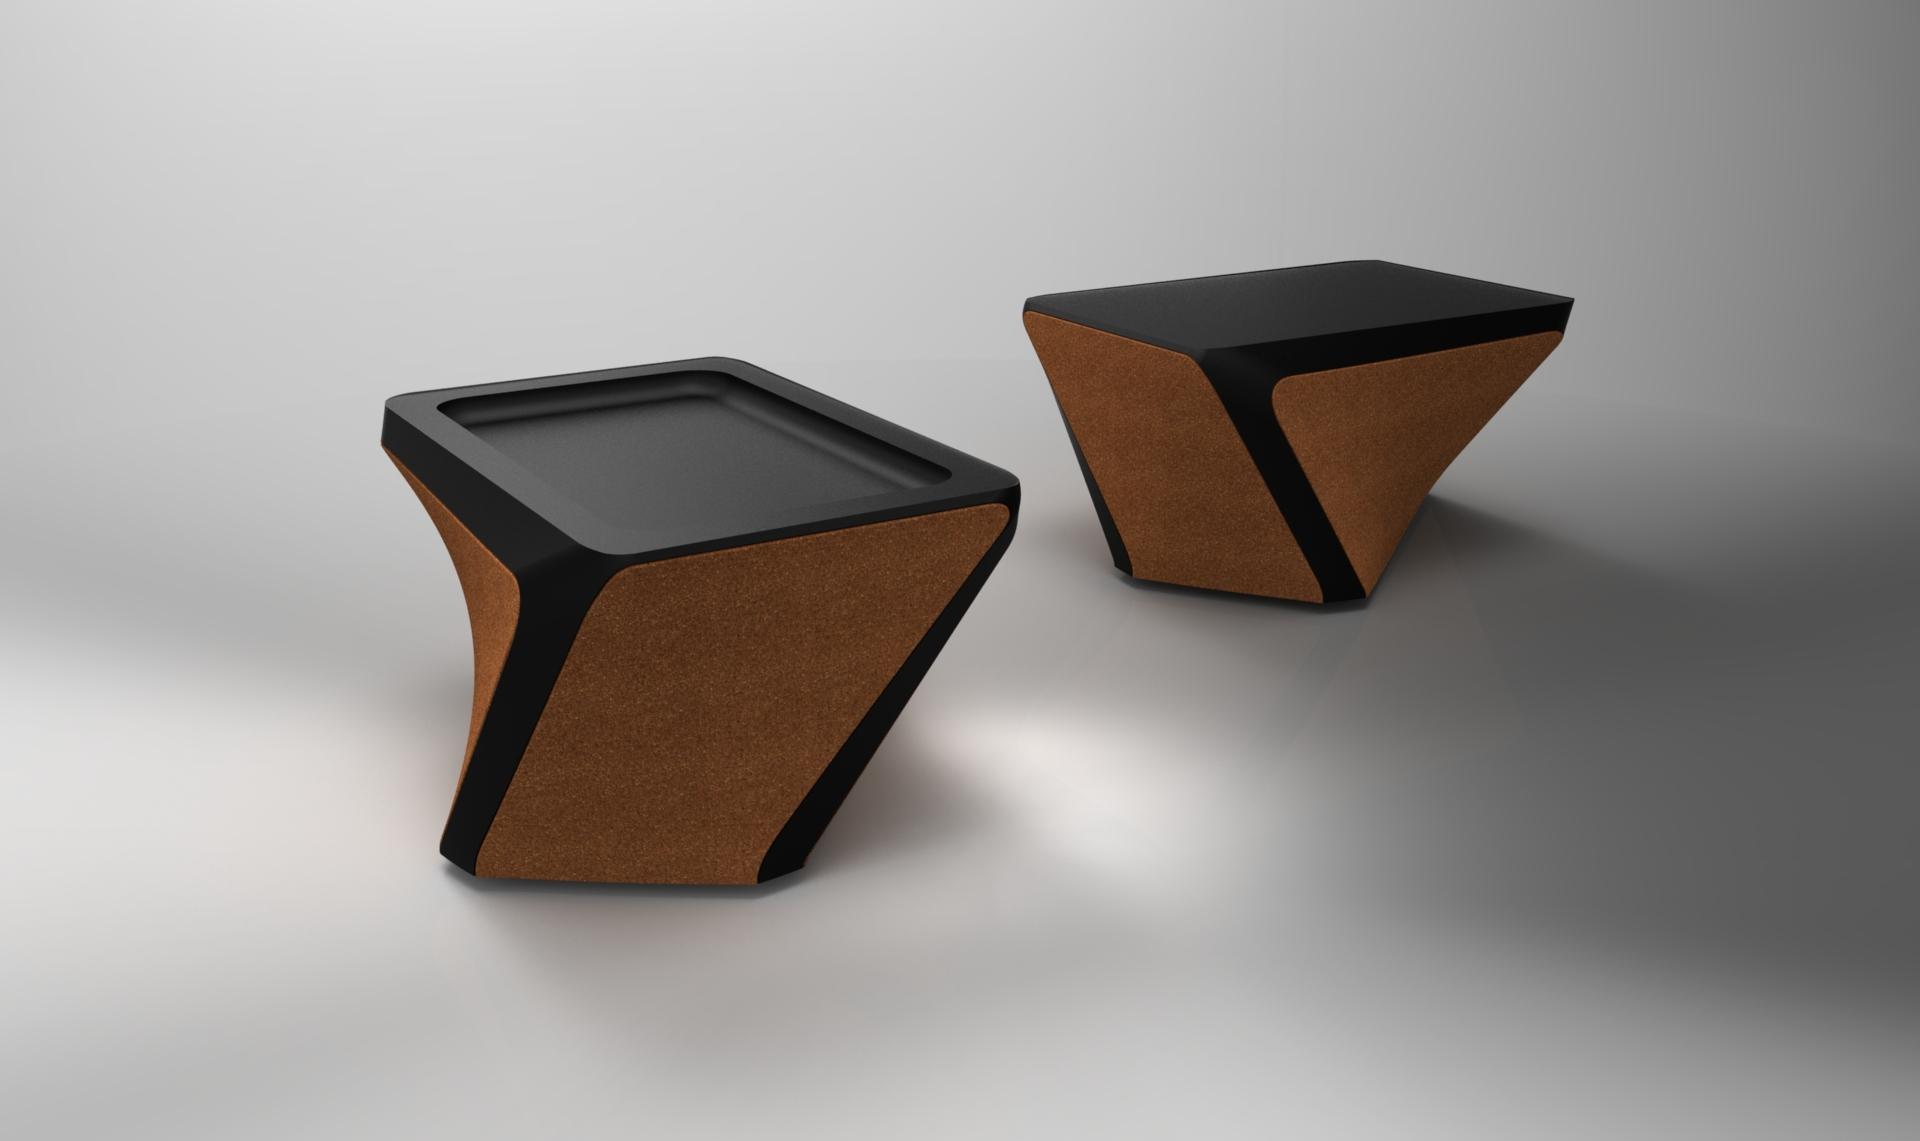 portable speaker design concept|autodesk online gallery